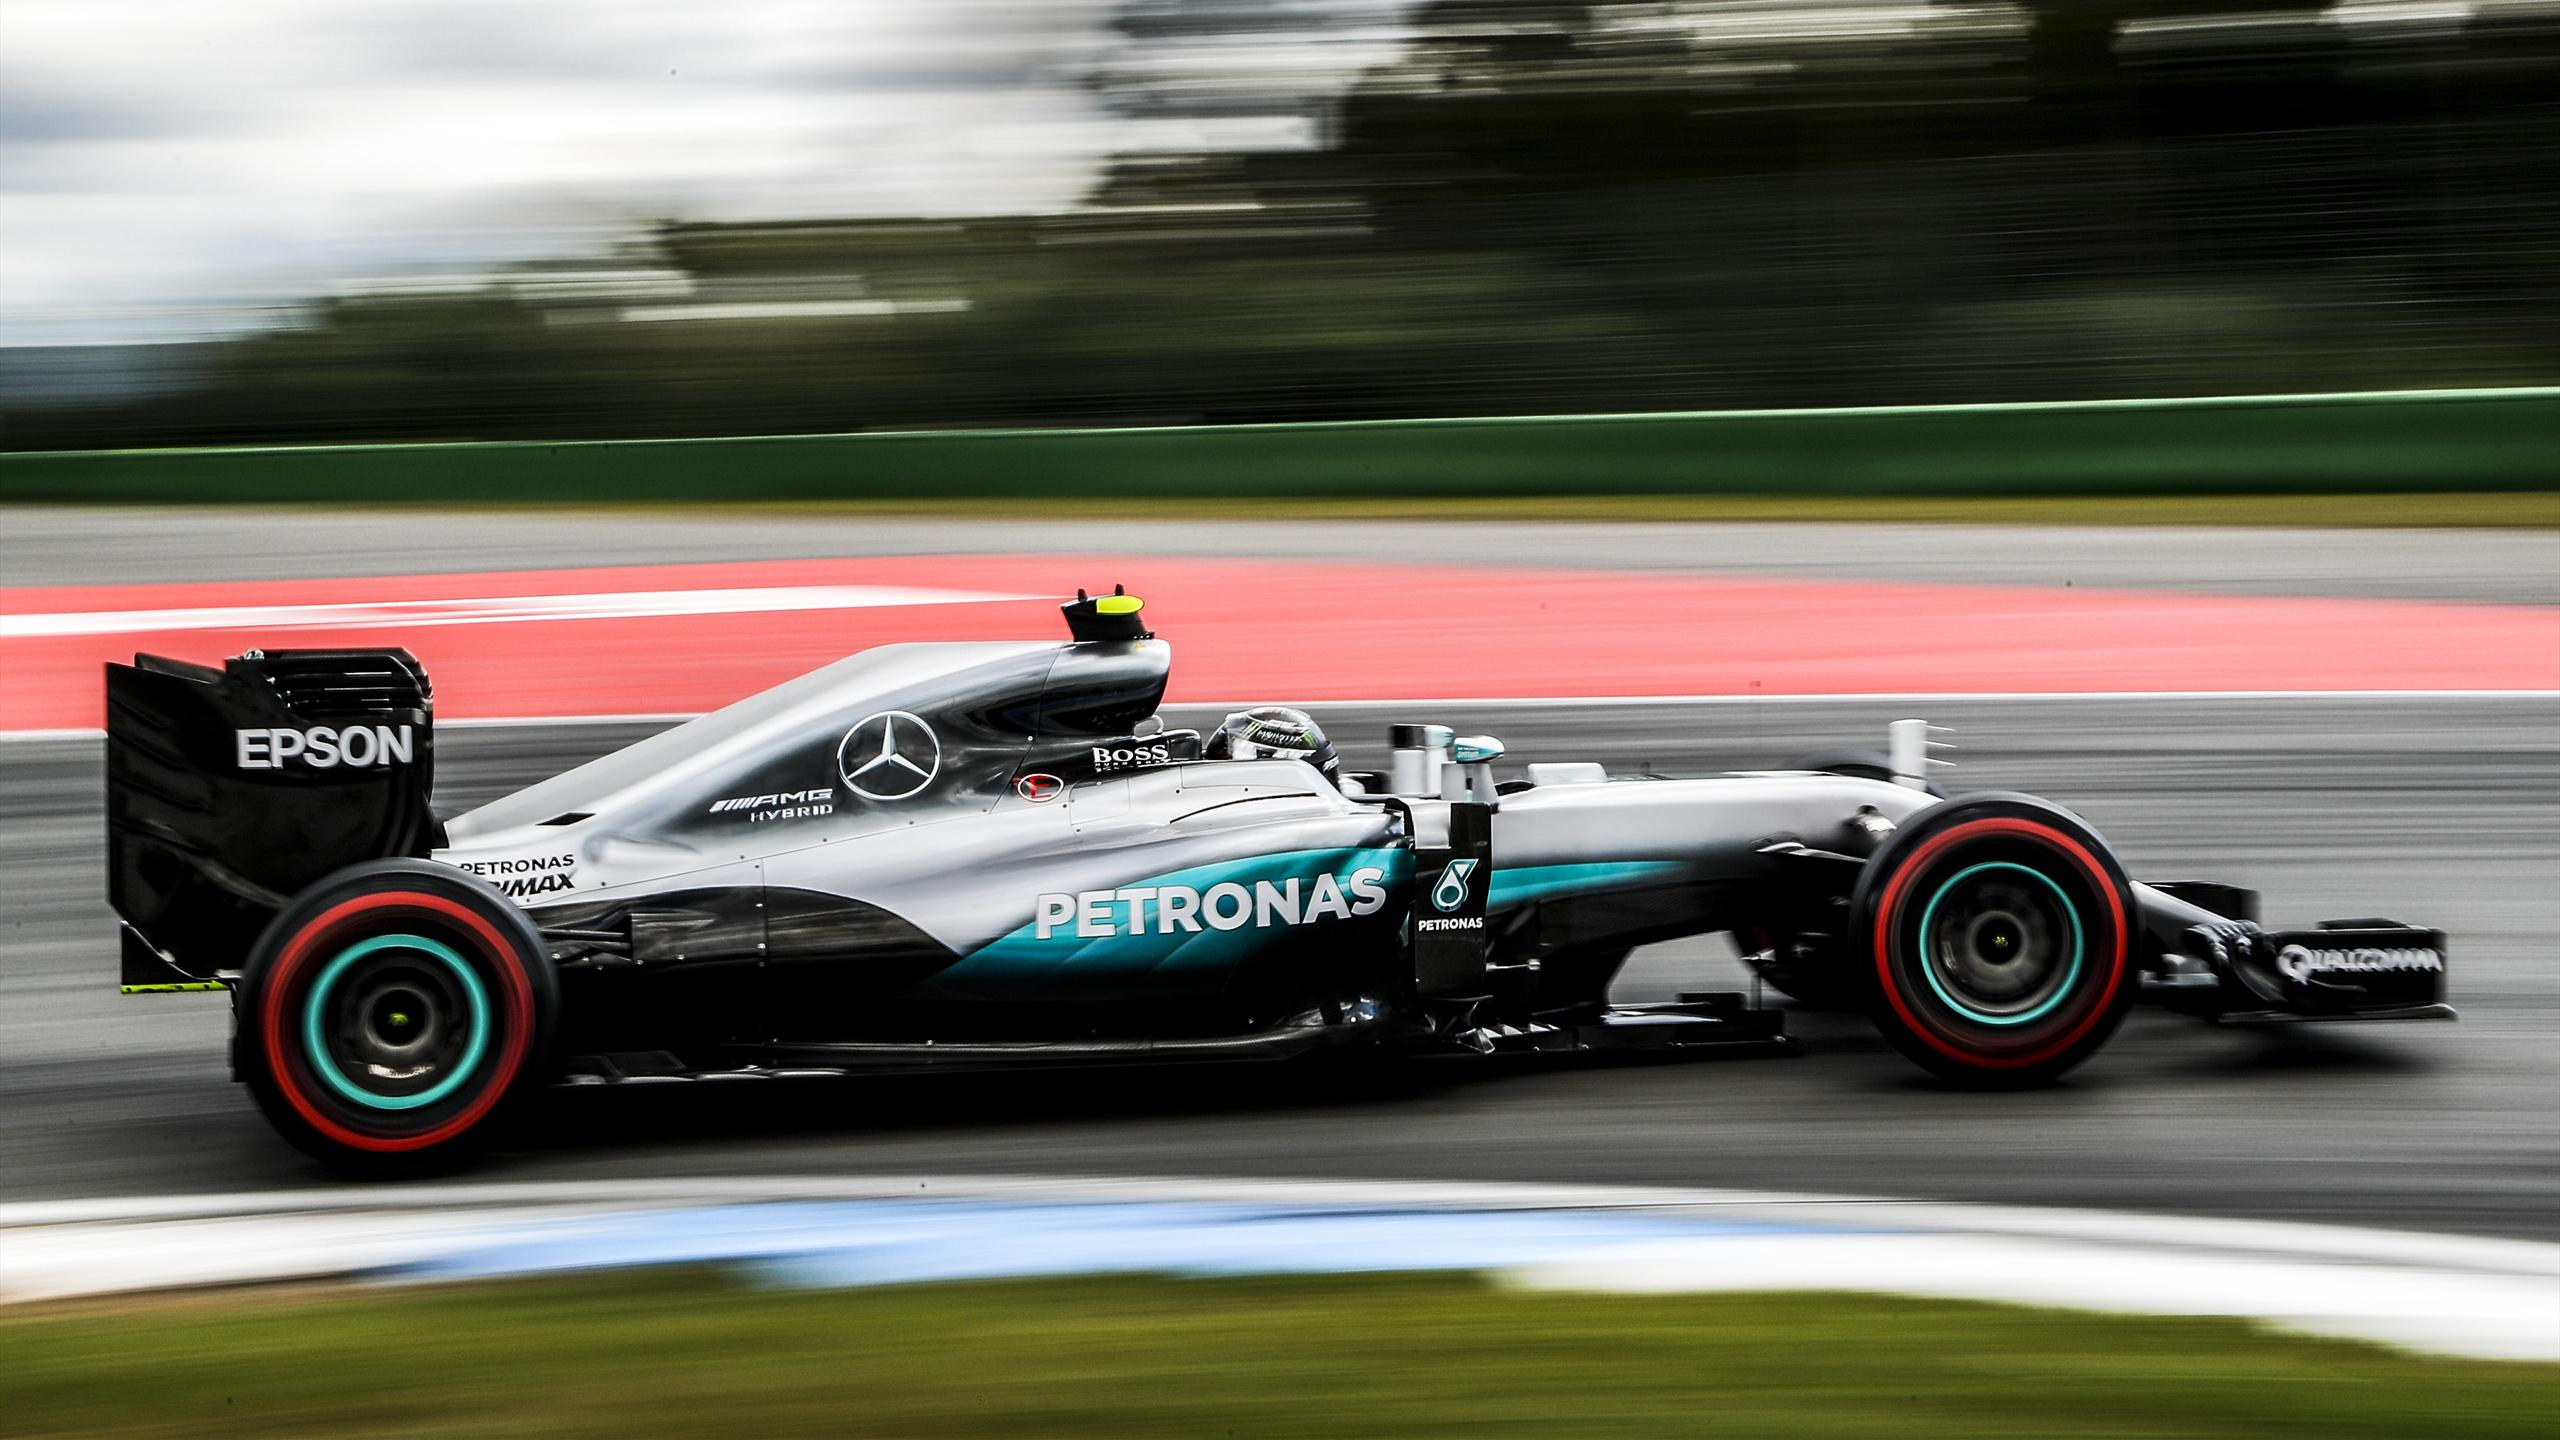 Nico Rosberg (Mercedes) au Grand Prix d'Allemagne 2016